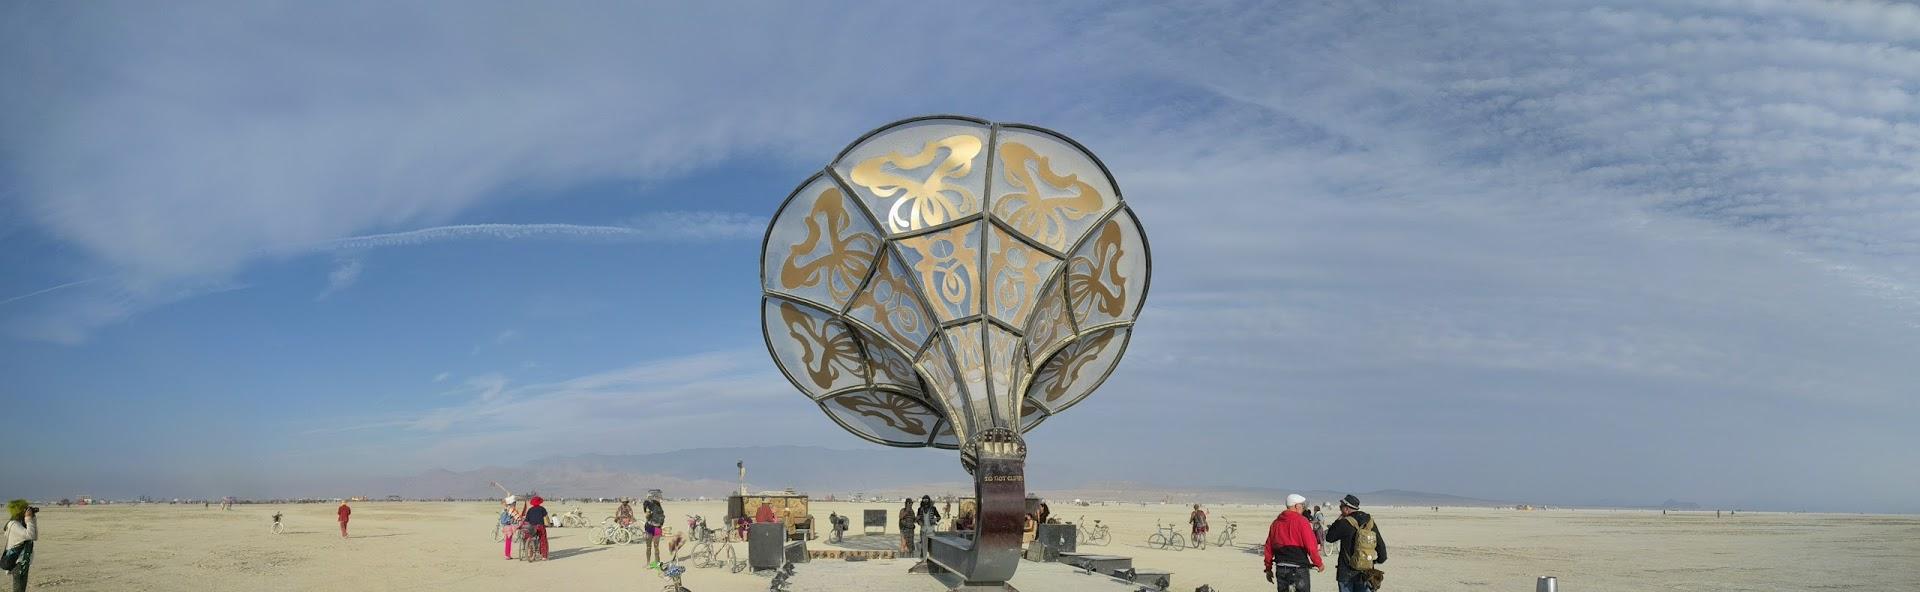 Burning Man 2016 (photo: Mike Pearson)